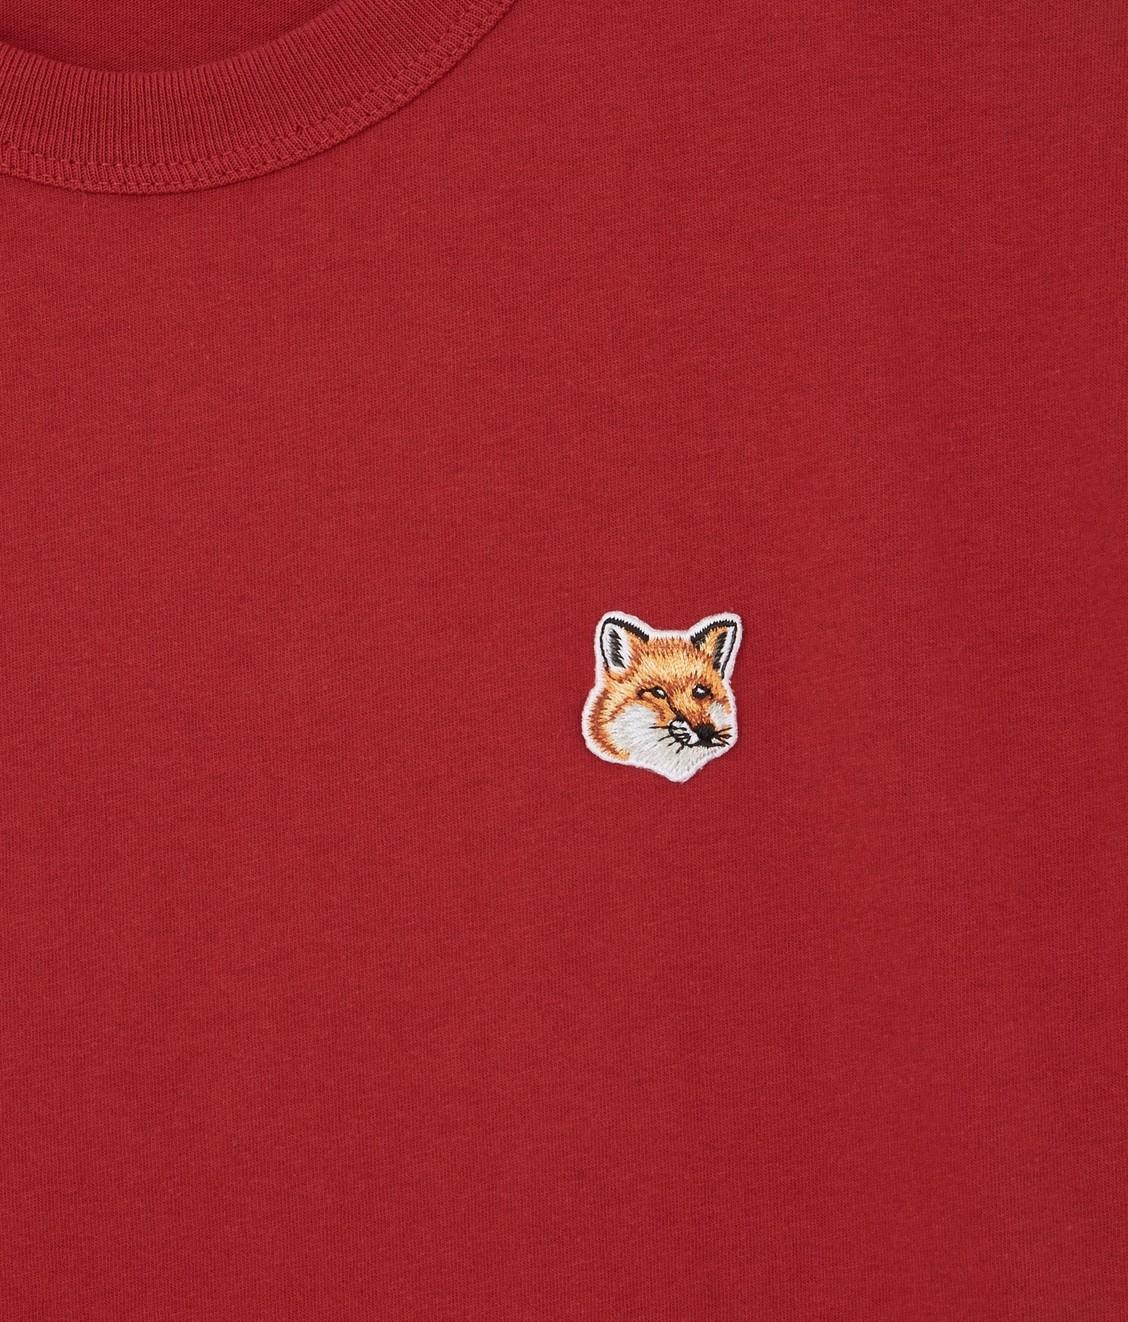 Maison Kitsune Maison Kitsune Tee Fox Head Patch Red